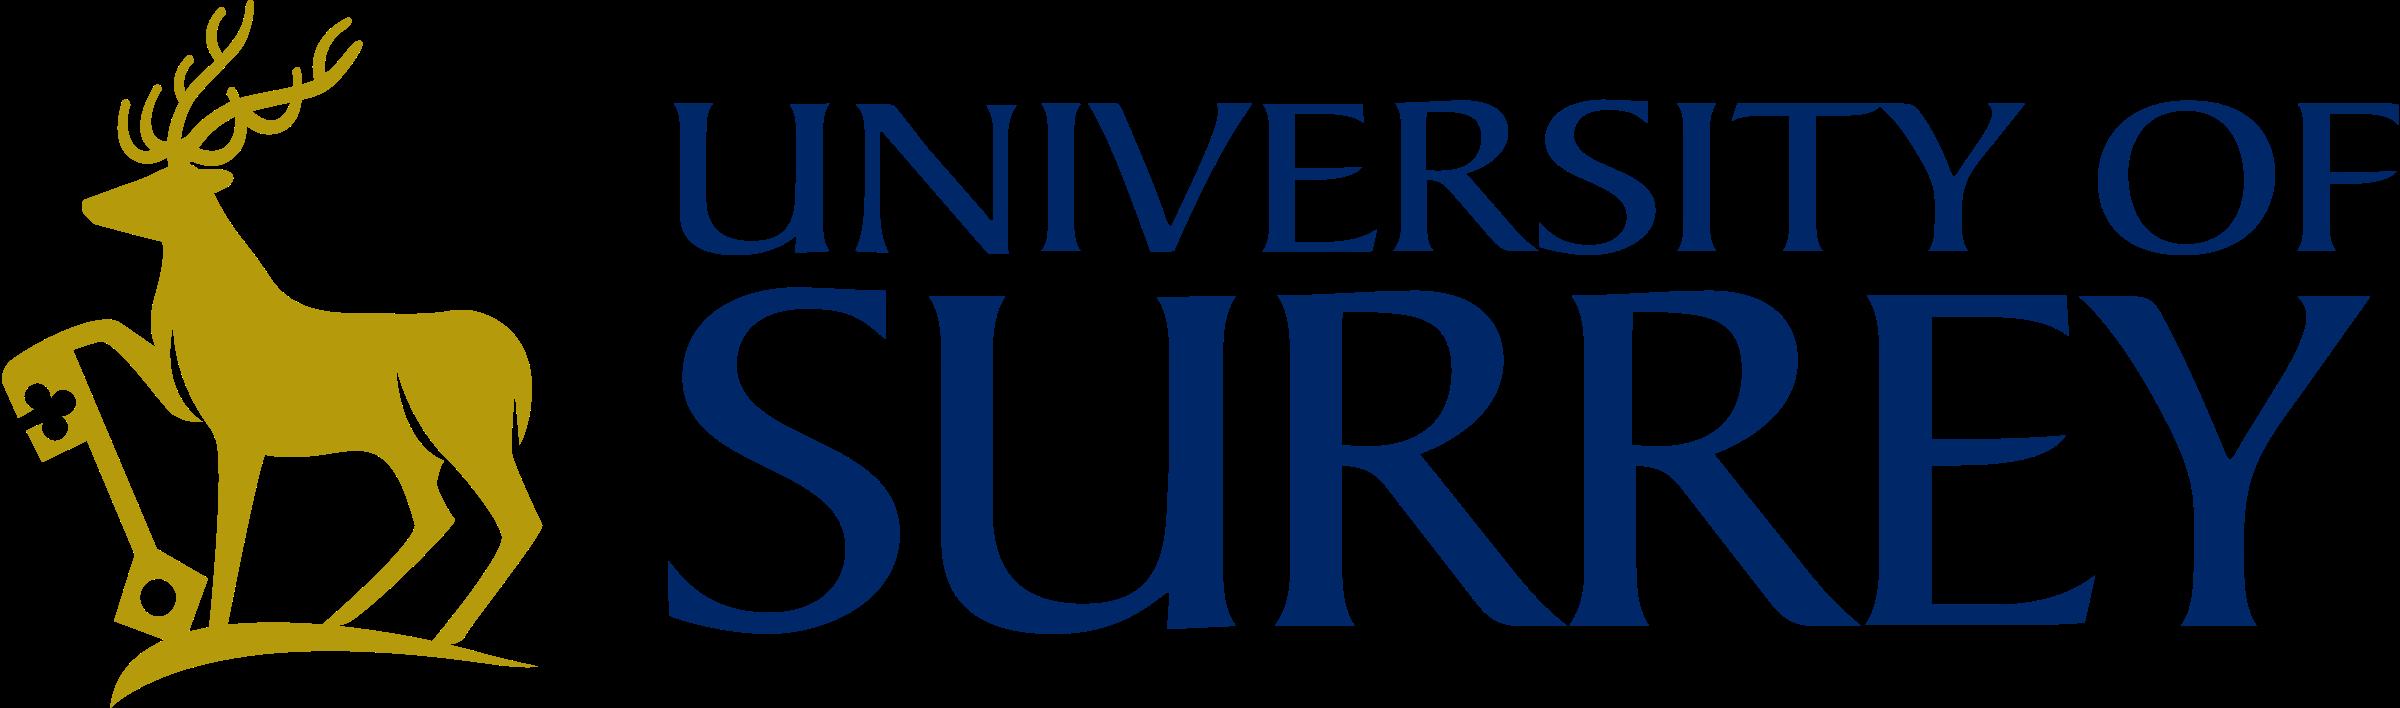 university-of-surrey-logo-png-transparent